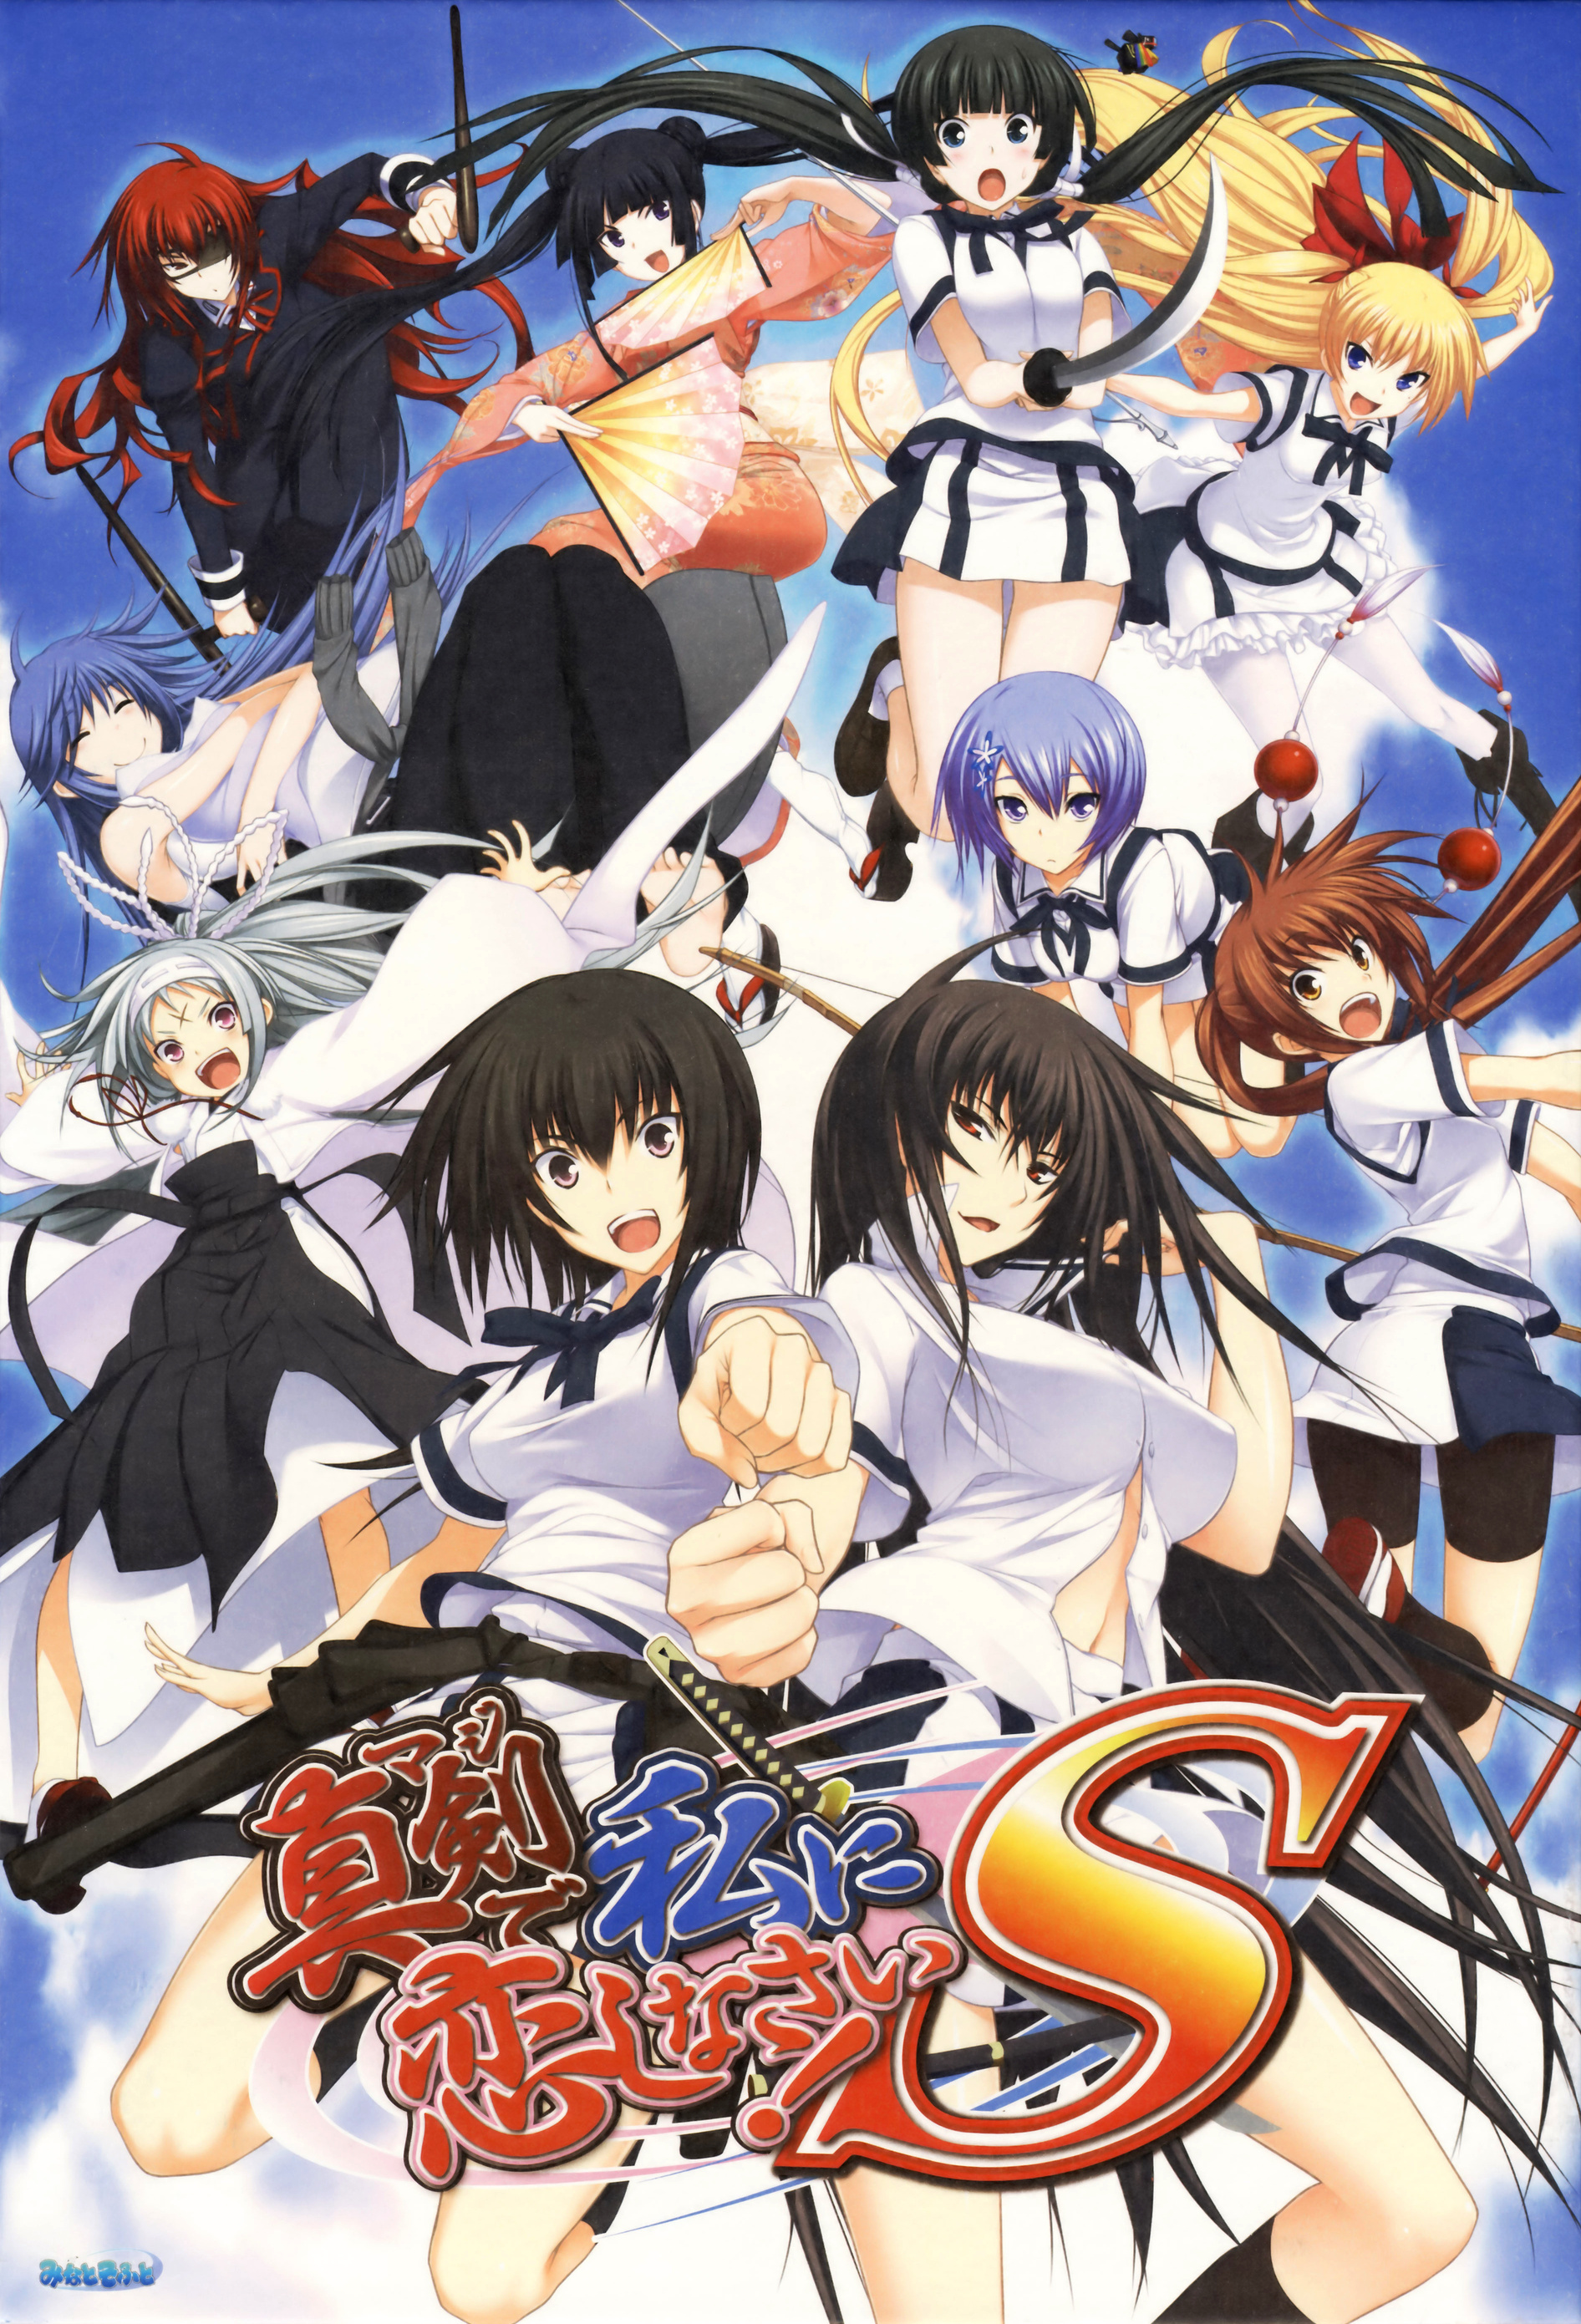 Hot anime girl base